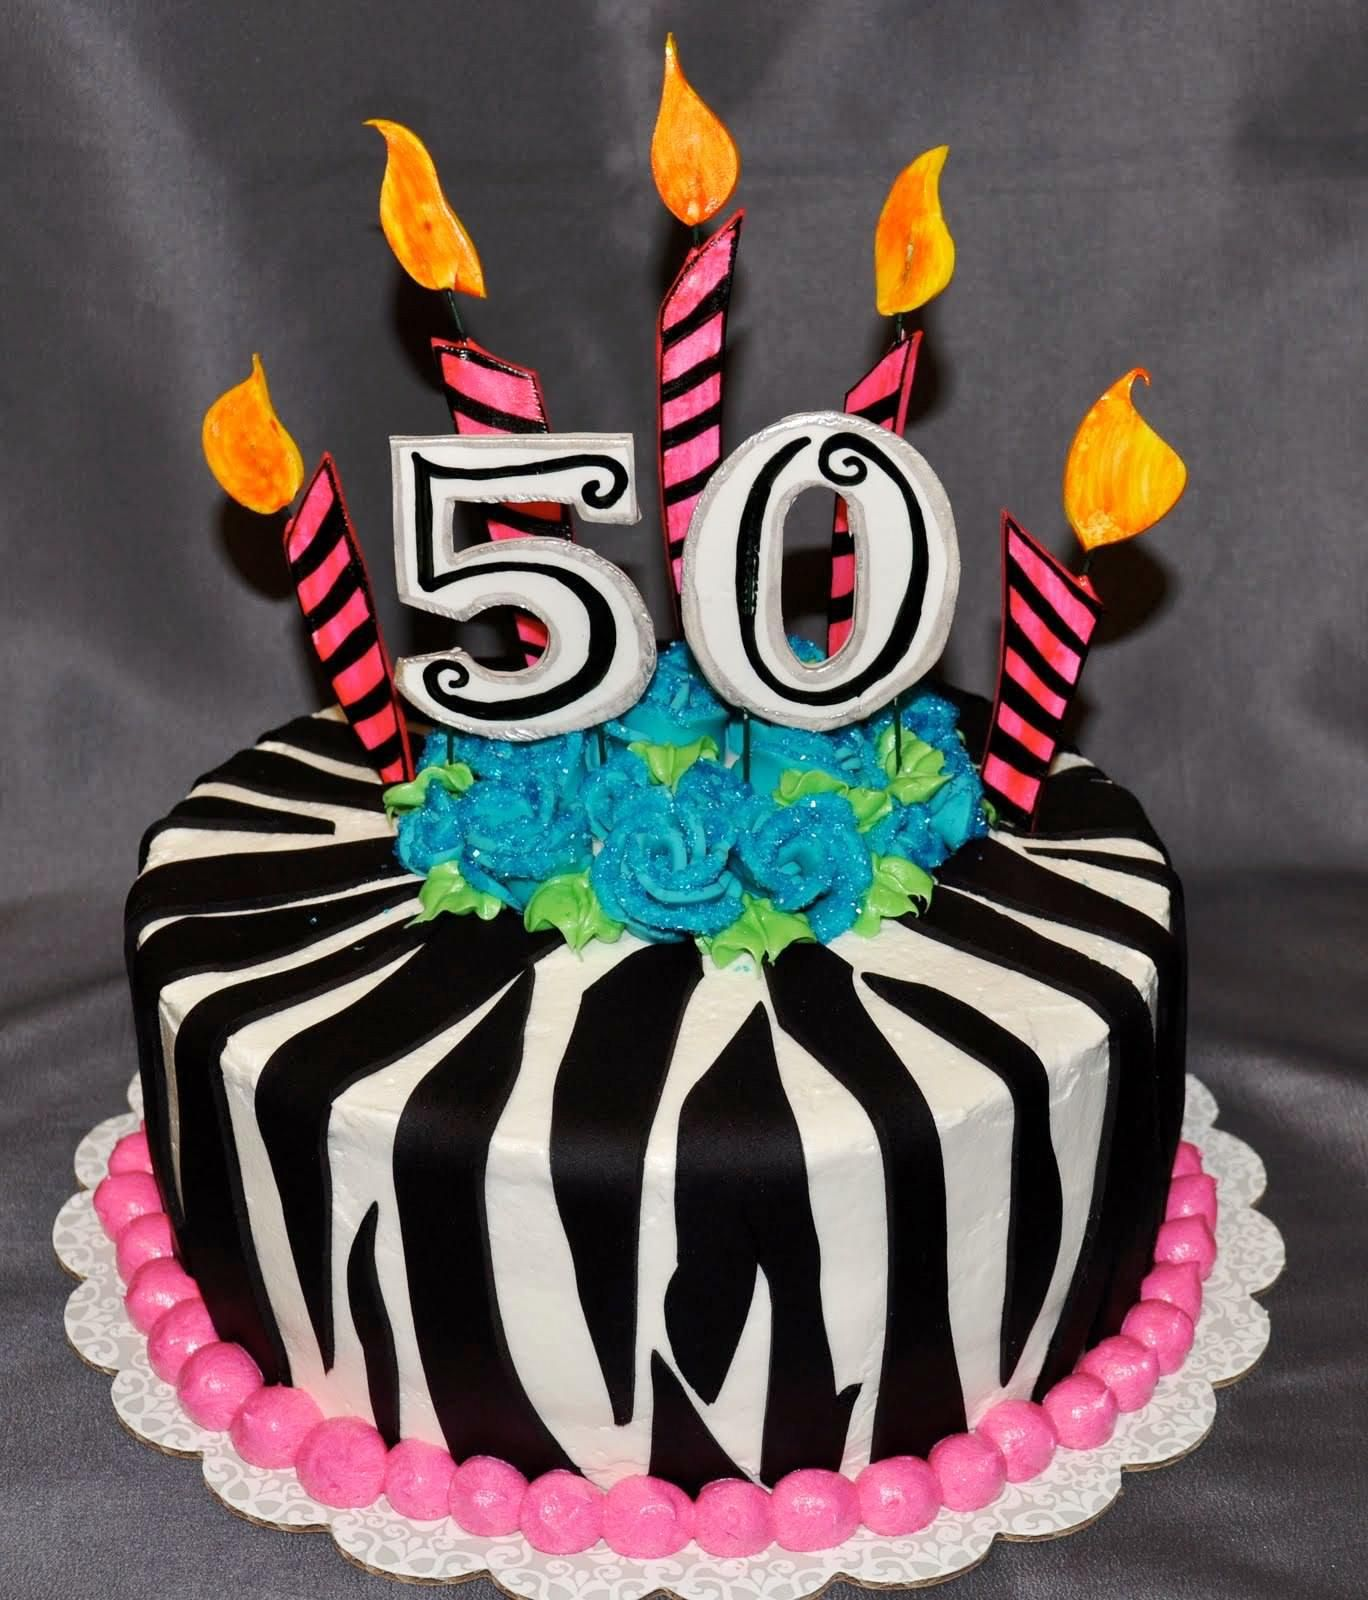 Image Of: 50th Birthday Cake Designs For Men